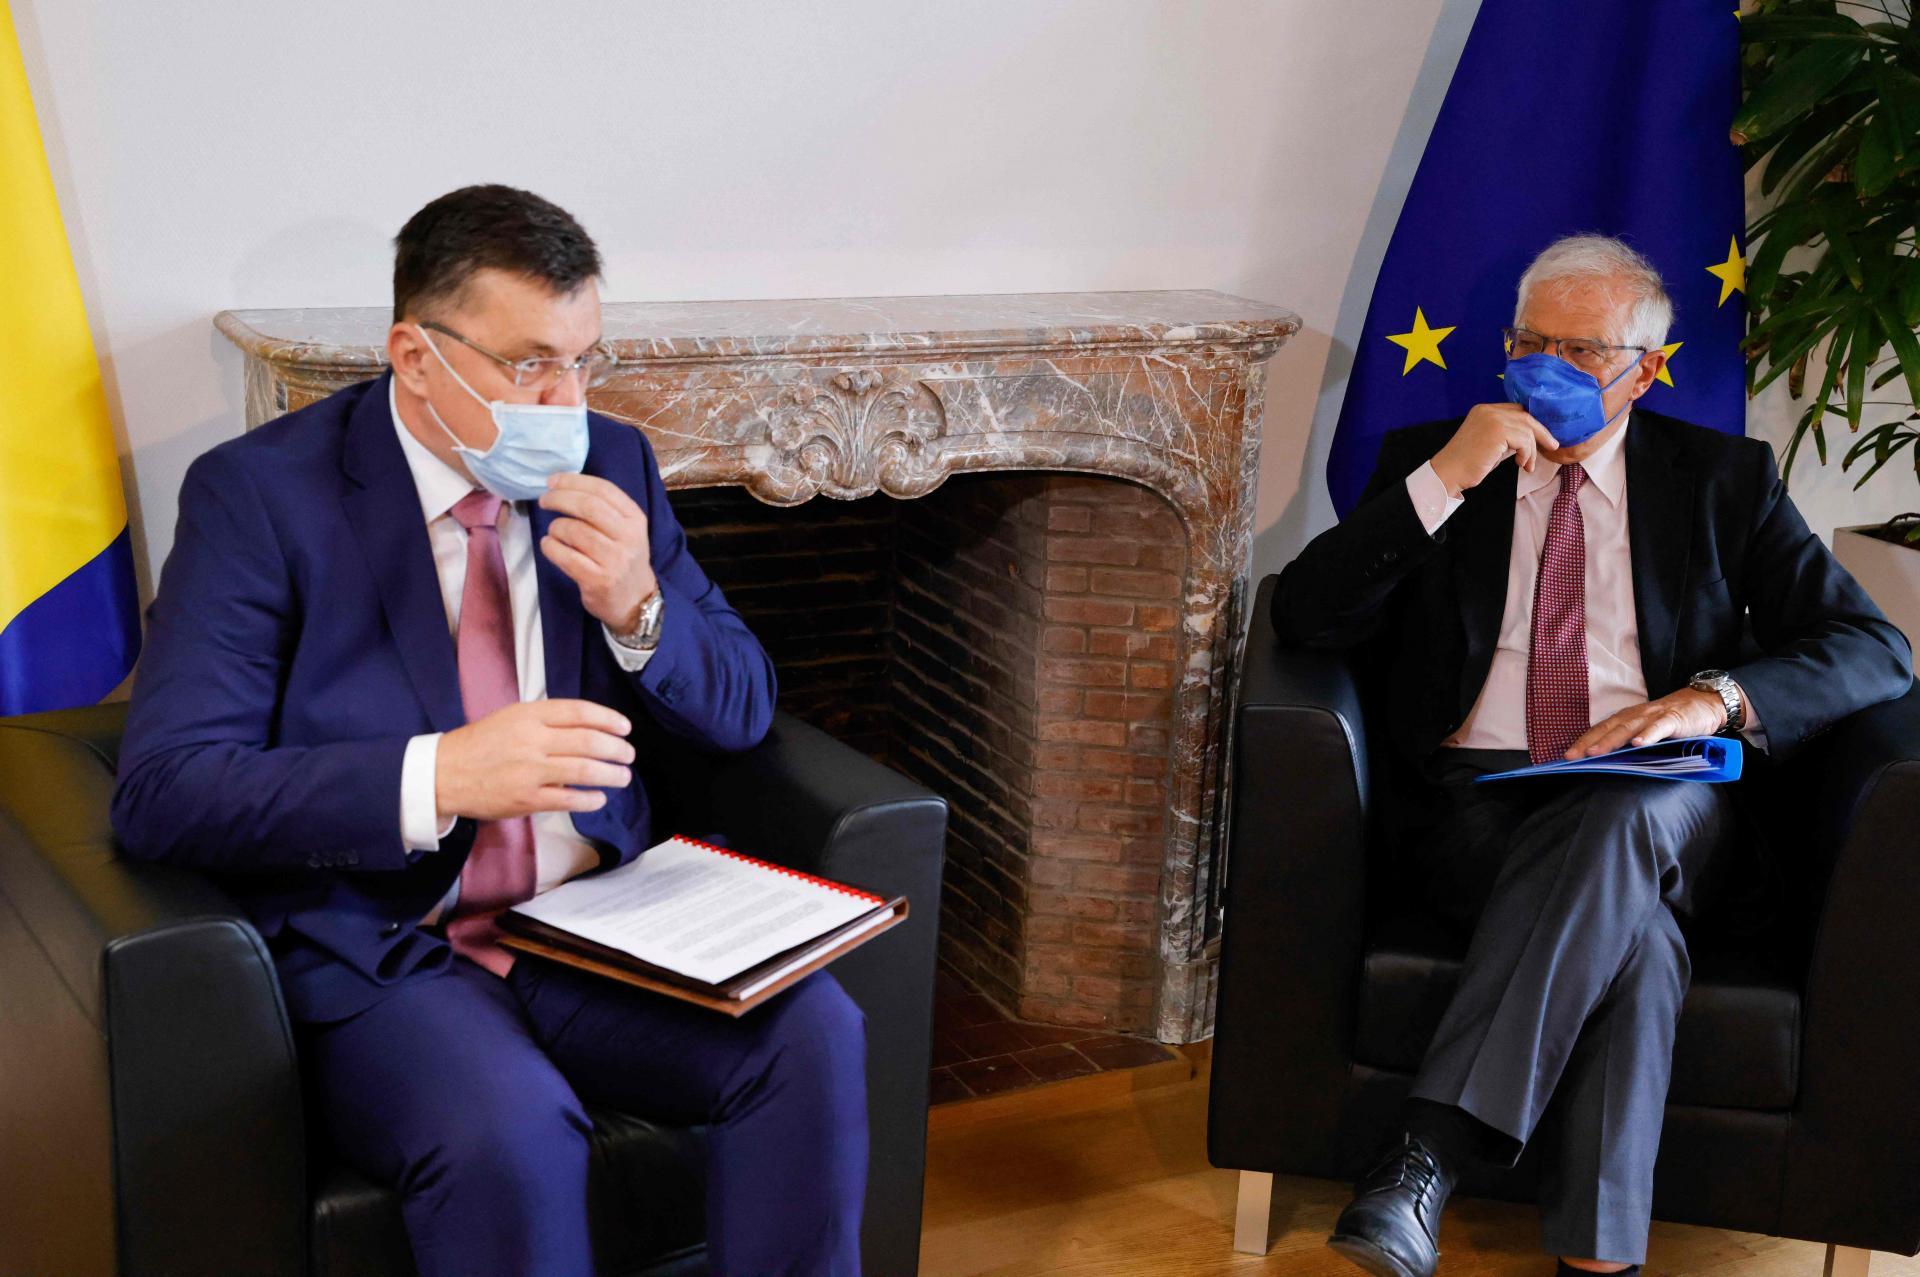 Bosna sastanak i snova hercegovina iz Dok se